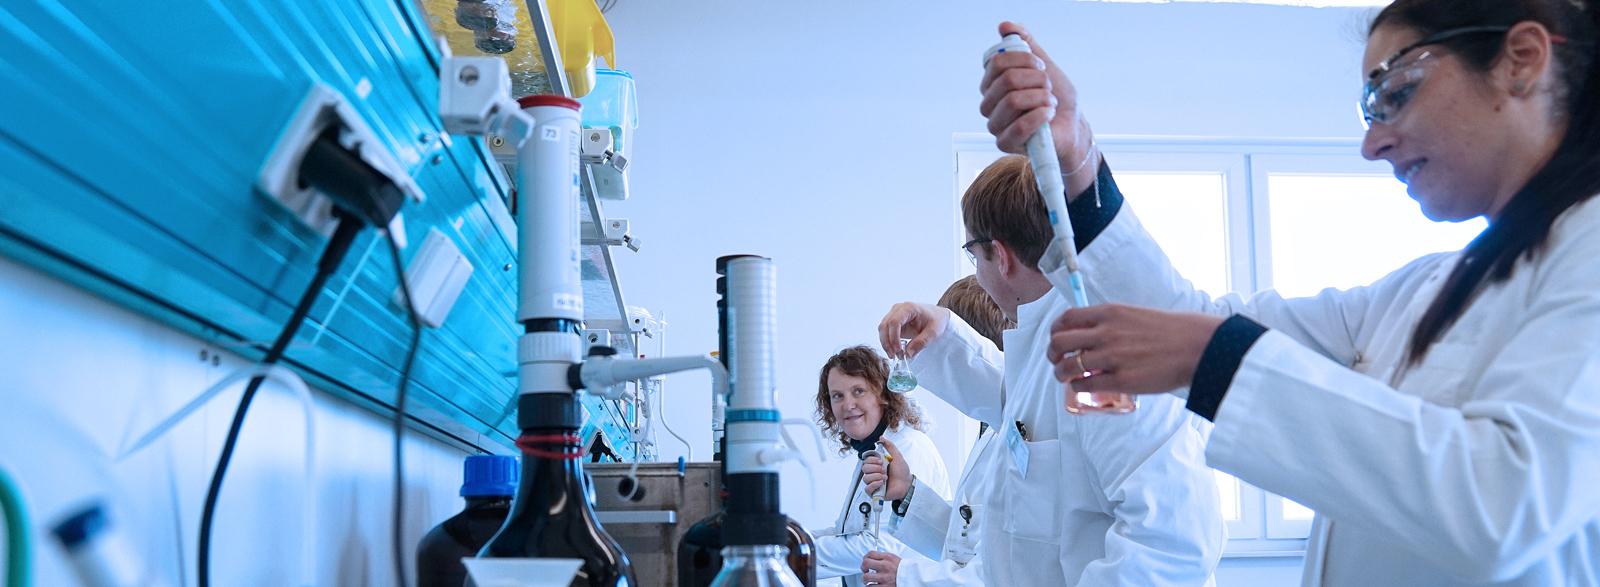 Career at DSI-pharm, laboratory for pharmaceutical analyses